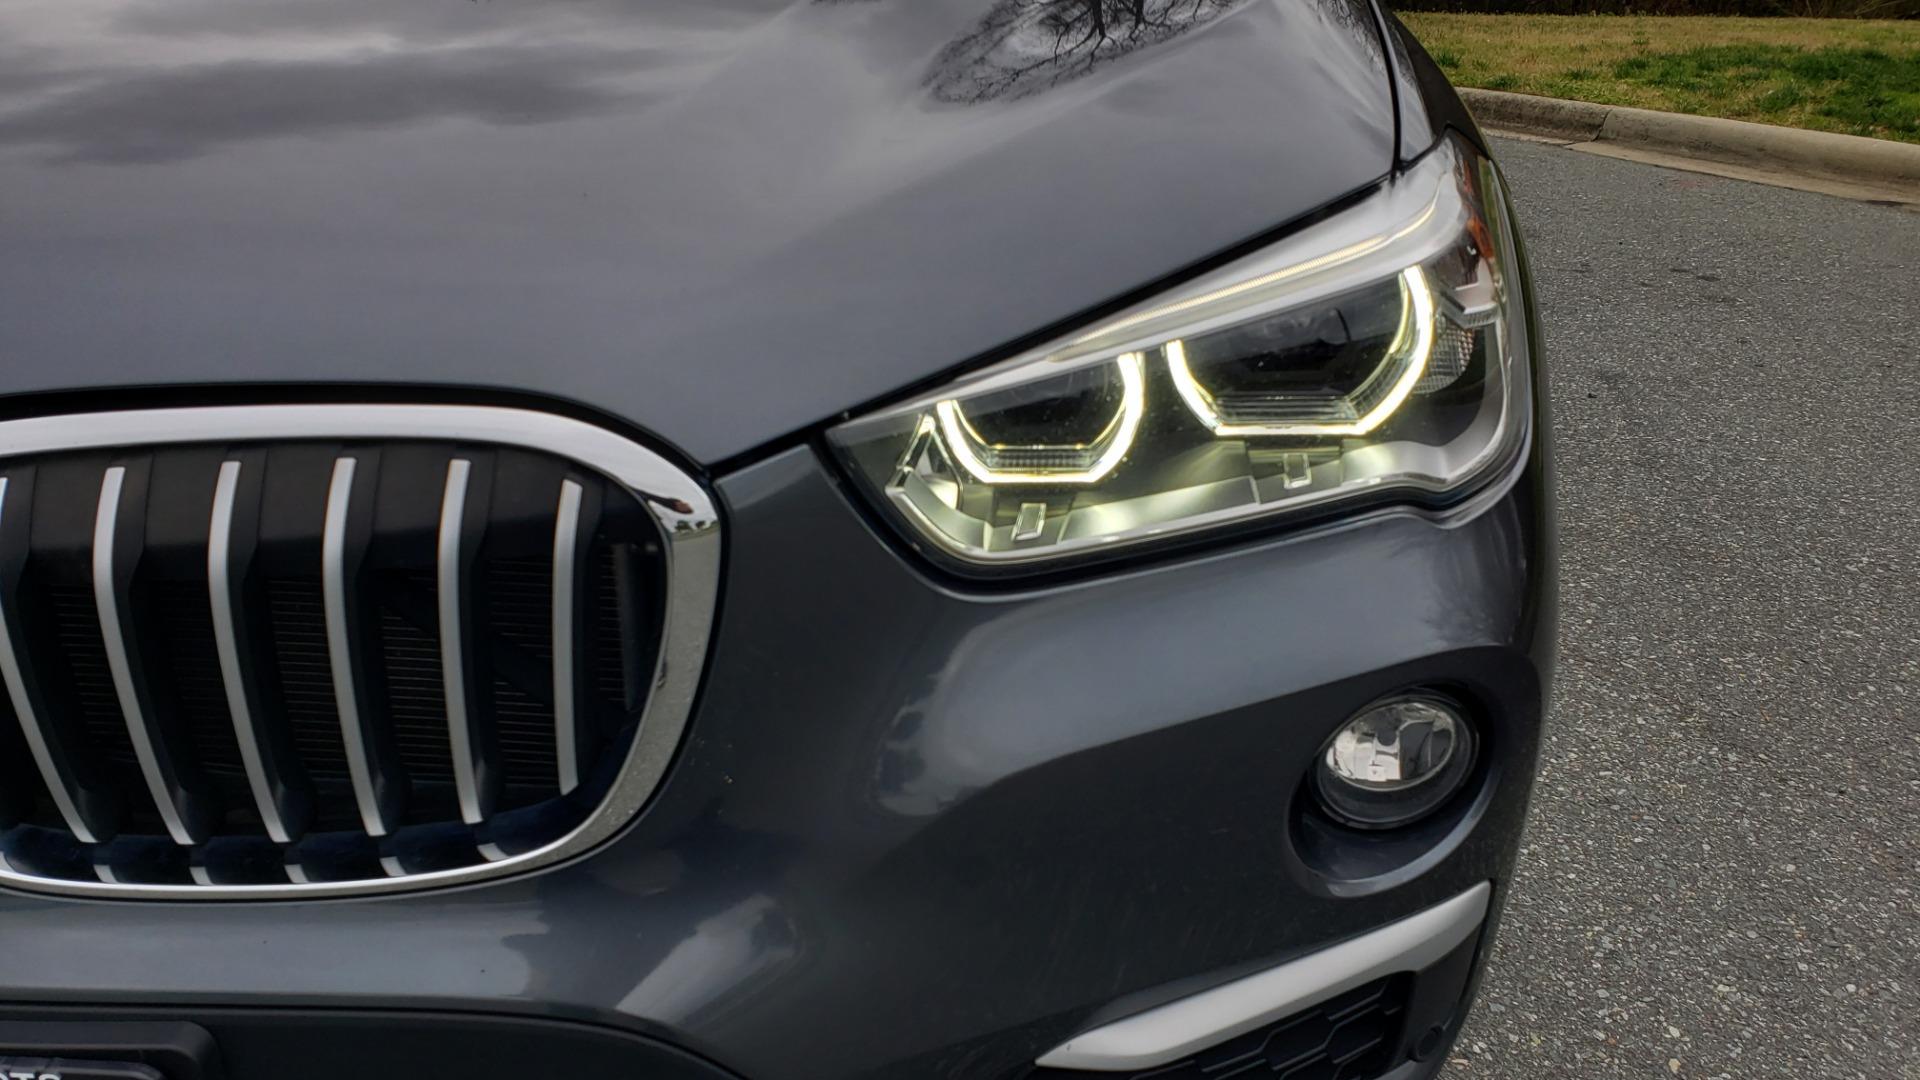 Used 2017 BMW X1 XDRIVE28I / PREM PKG / DRIVER ASST / NAV / CLD WTHR for sale Sold at Formula Imports in Charlotte NC 28227 24